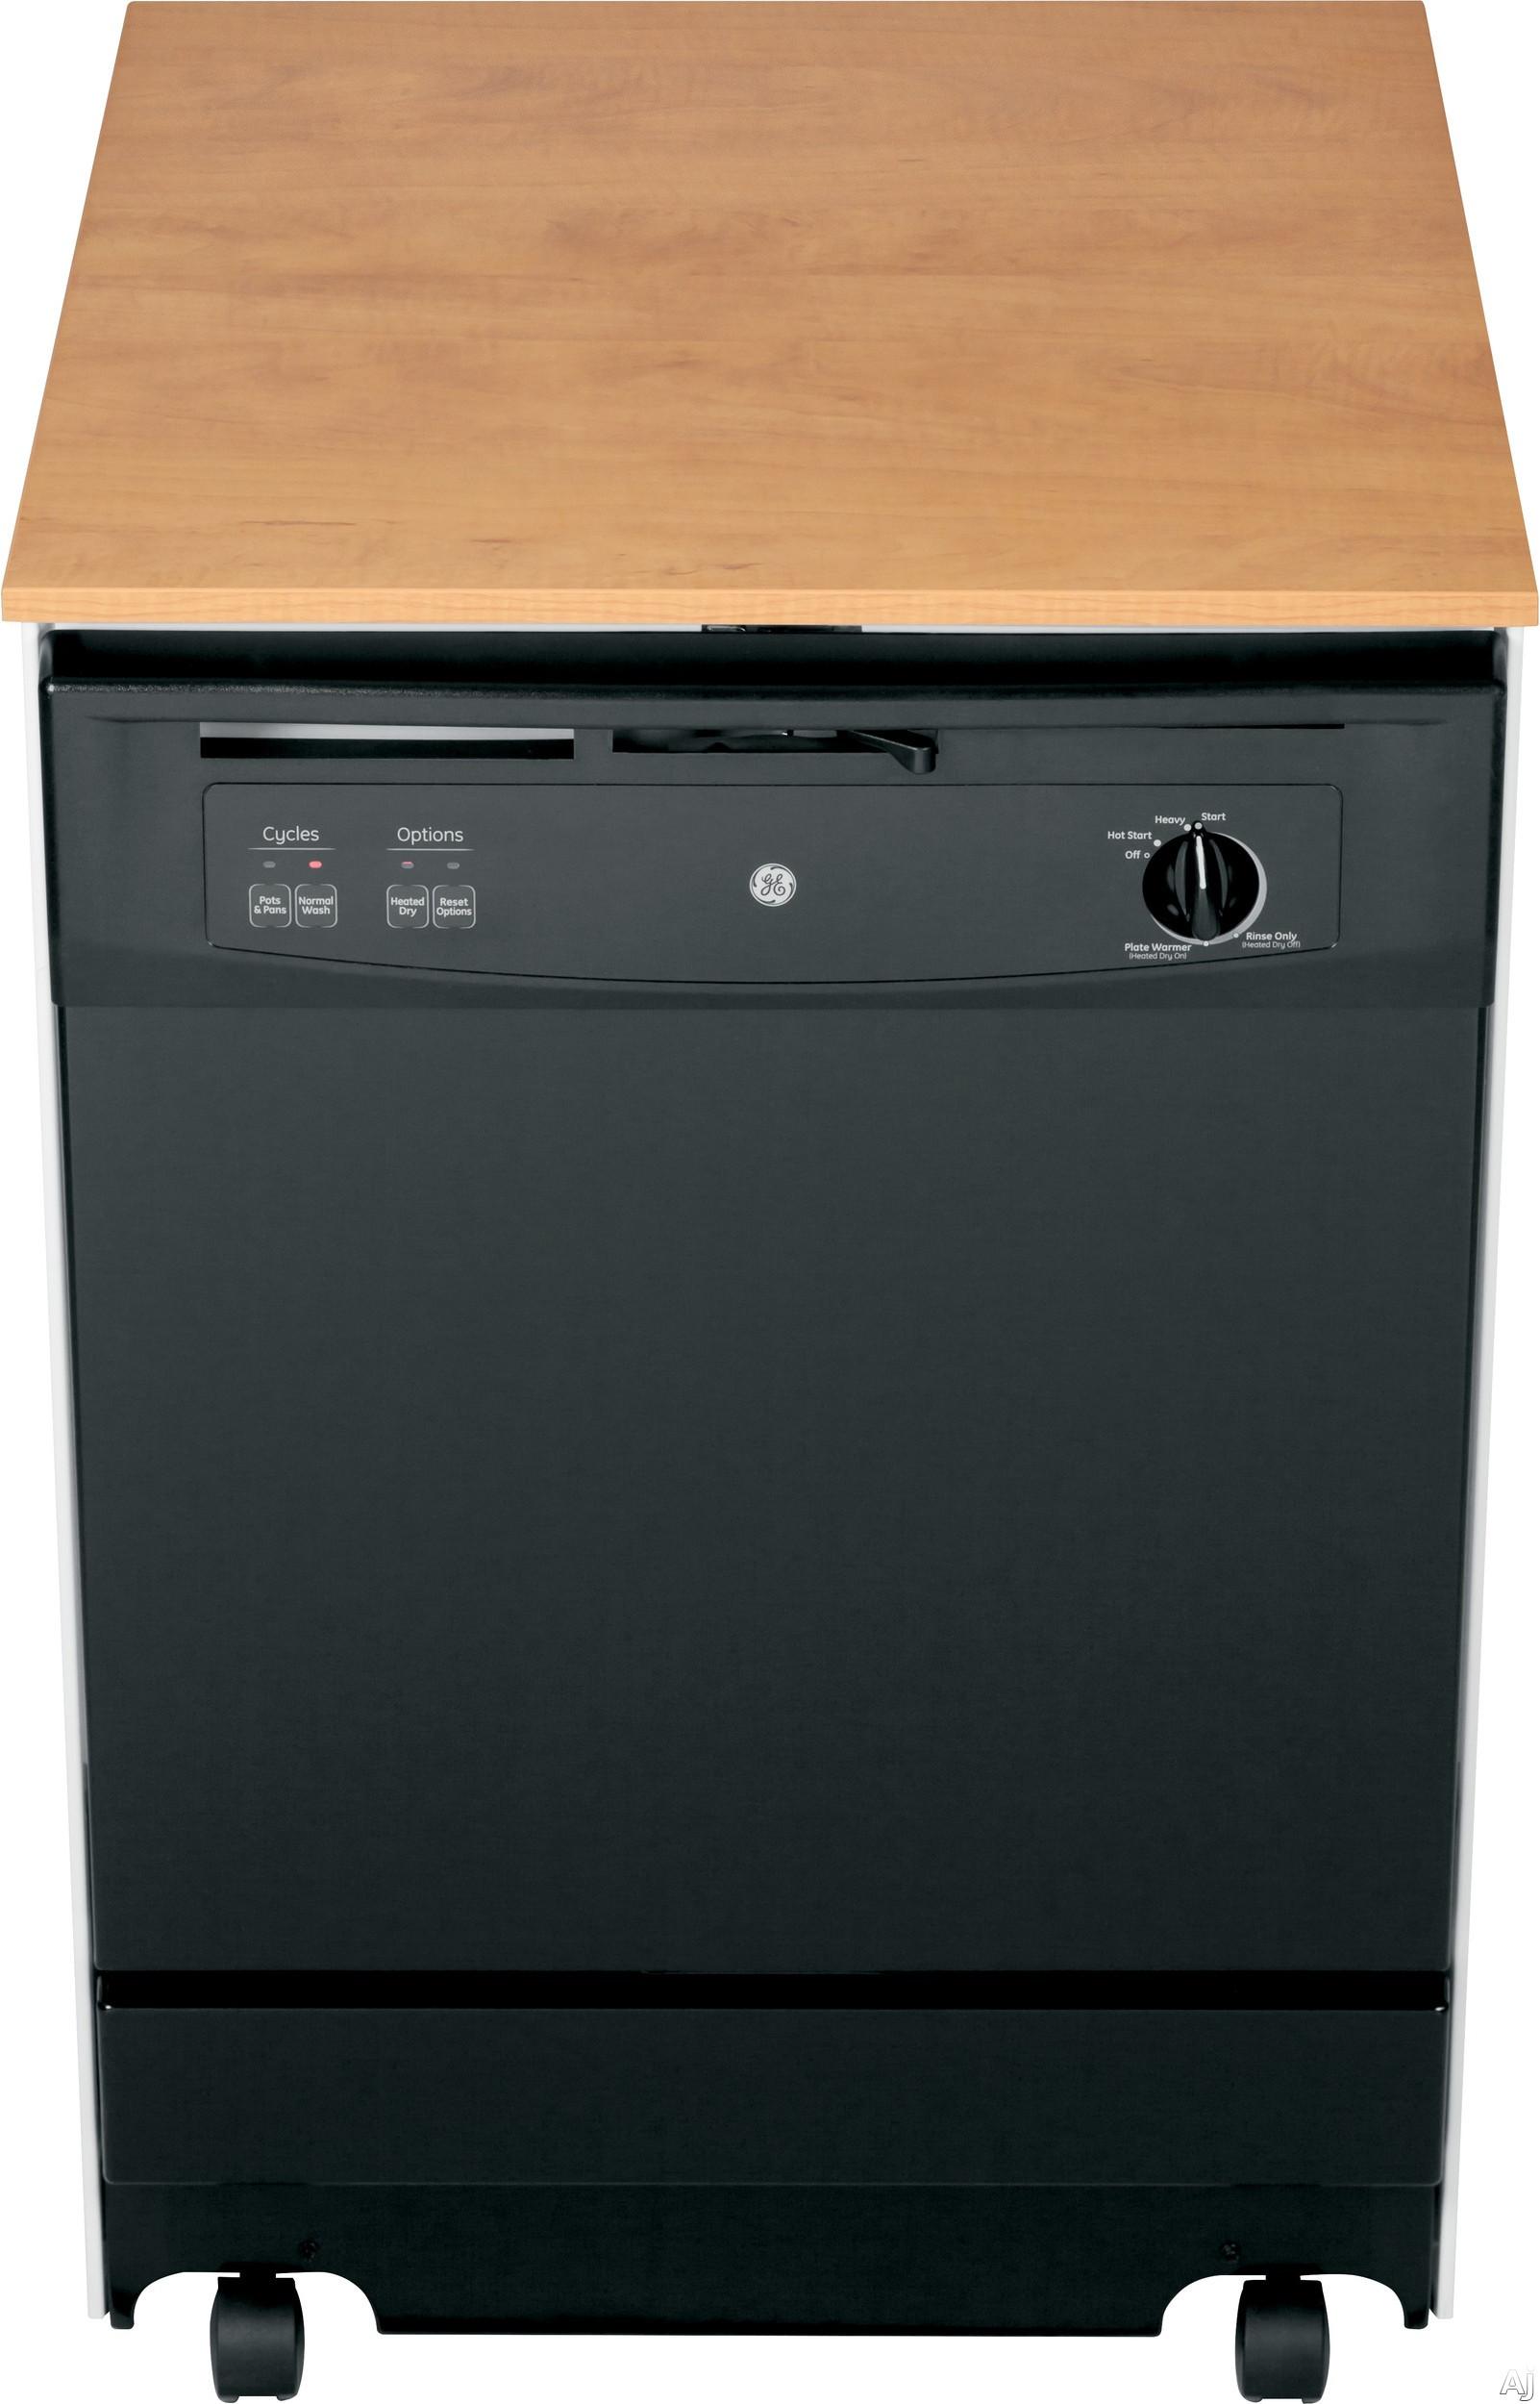 GE Dishwashers,GE Portable Dishwashers